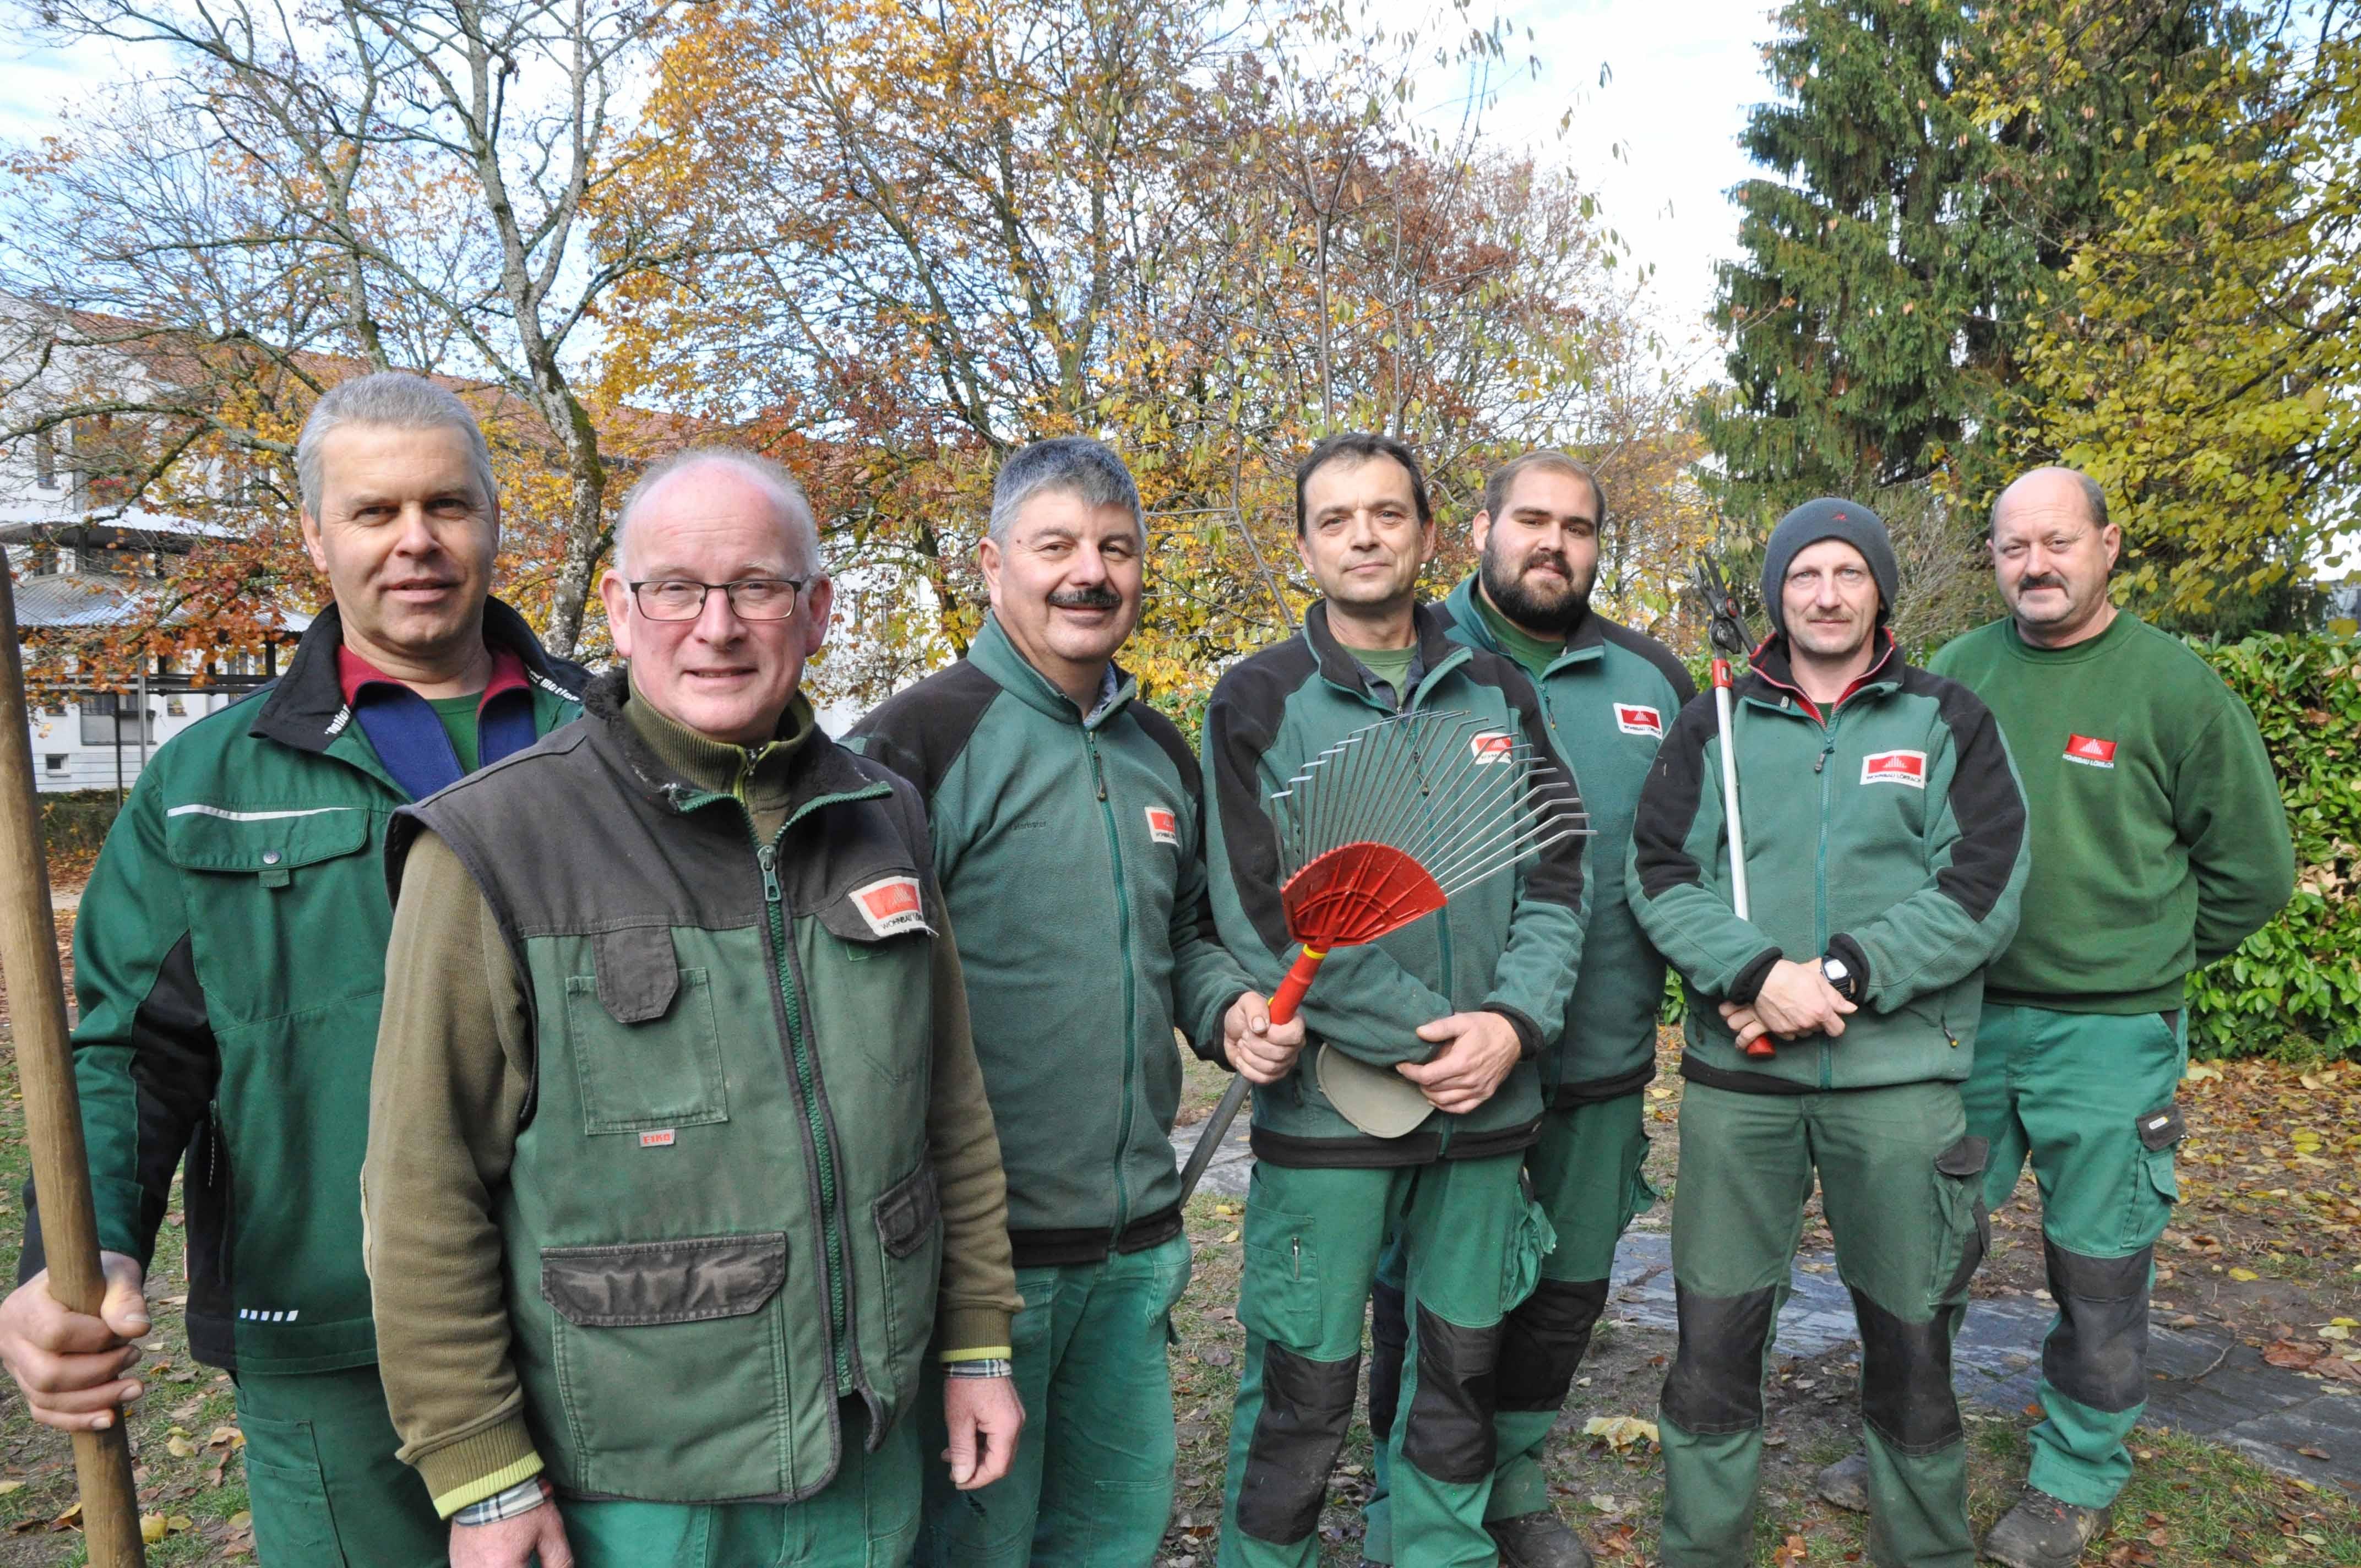 Unser Gärtner-Team